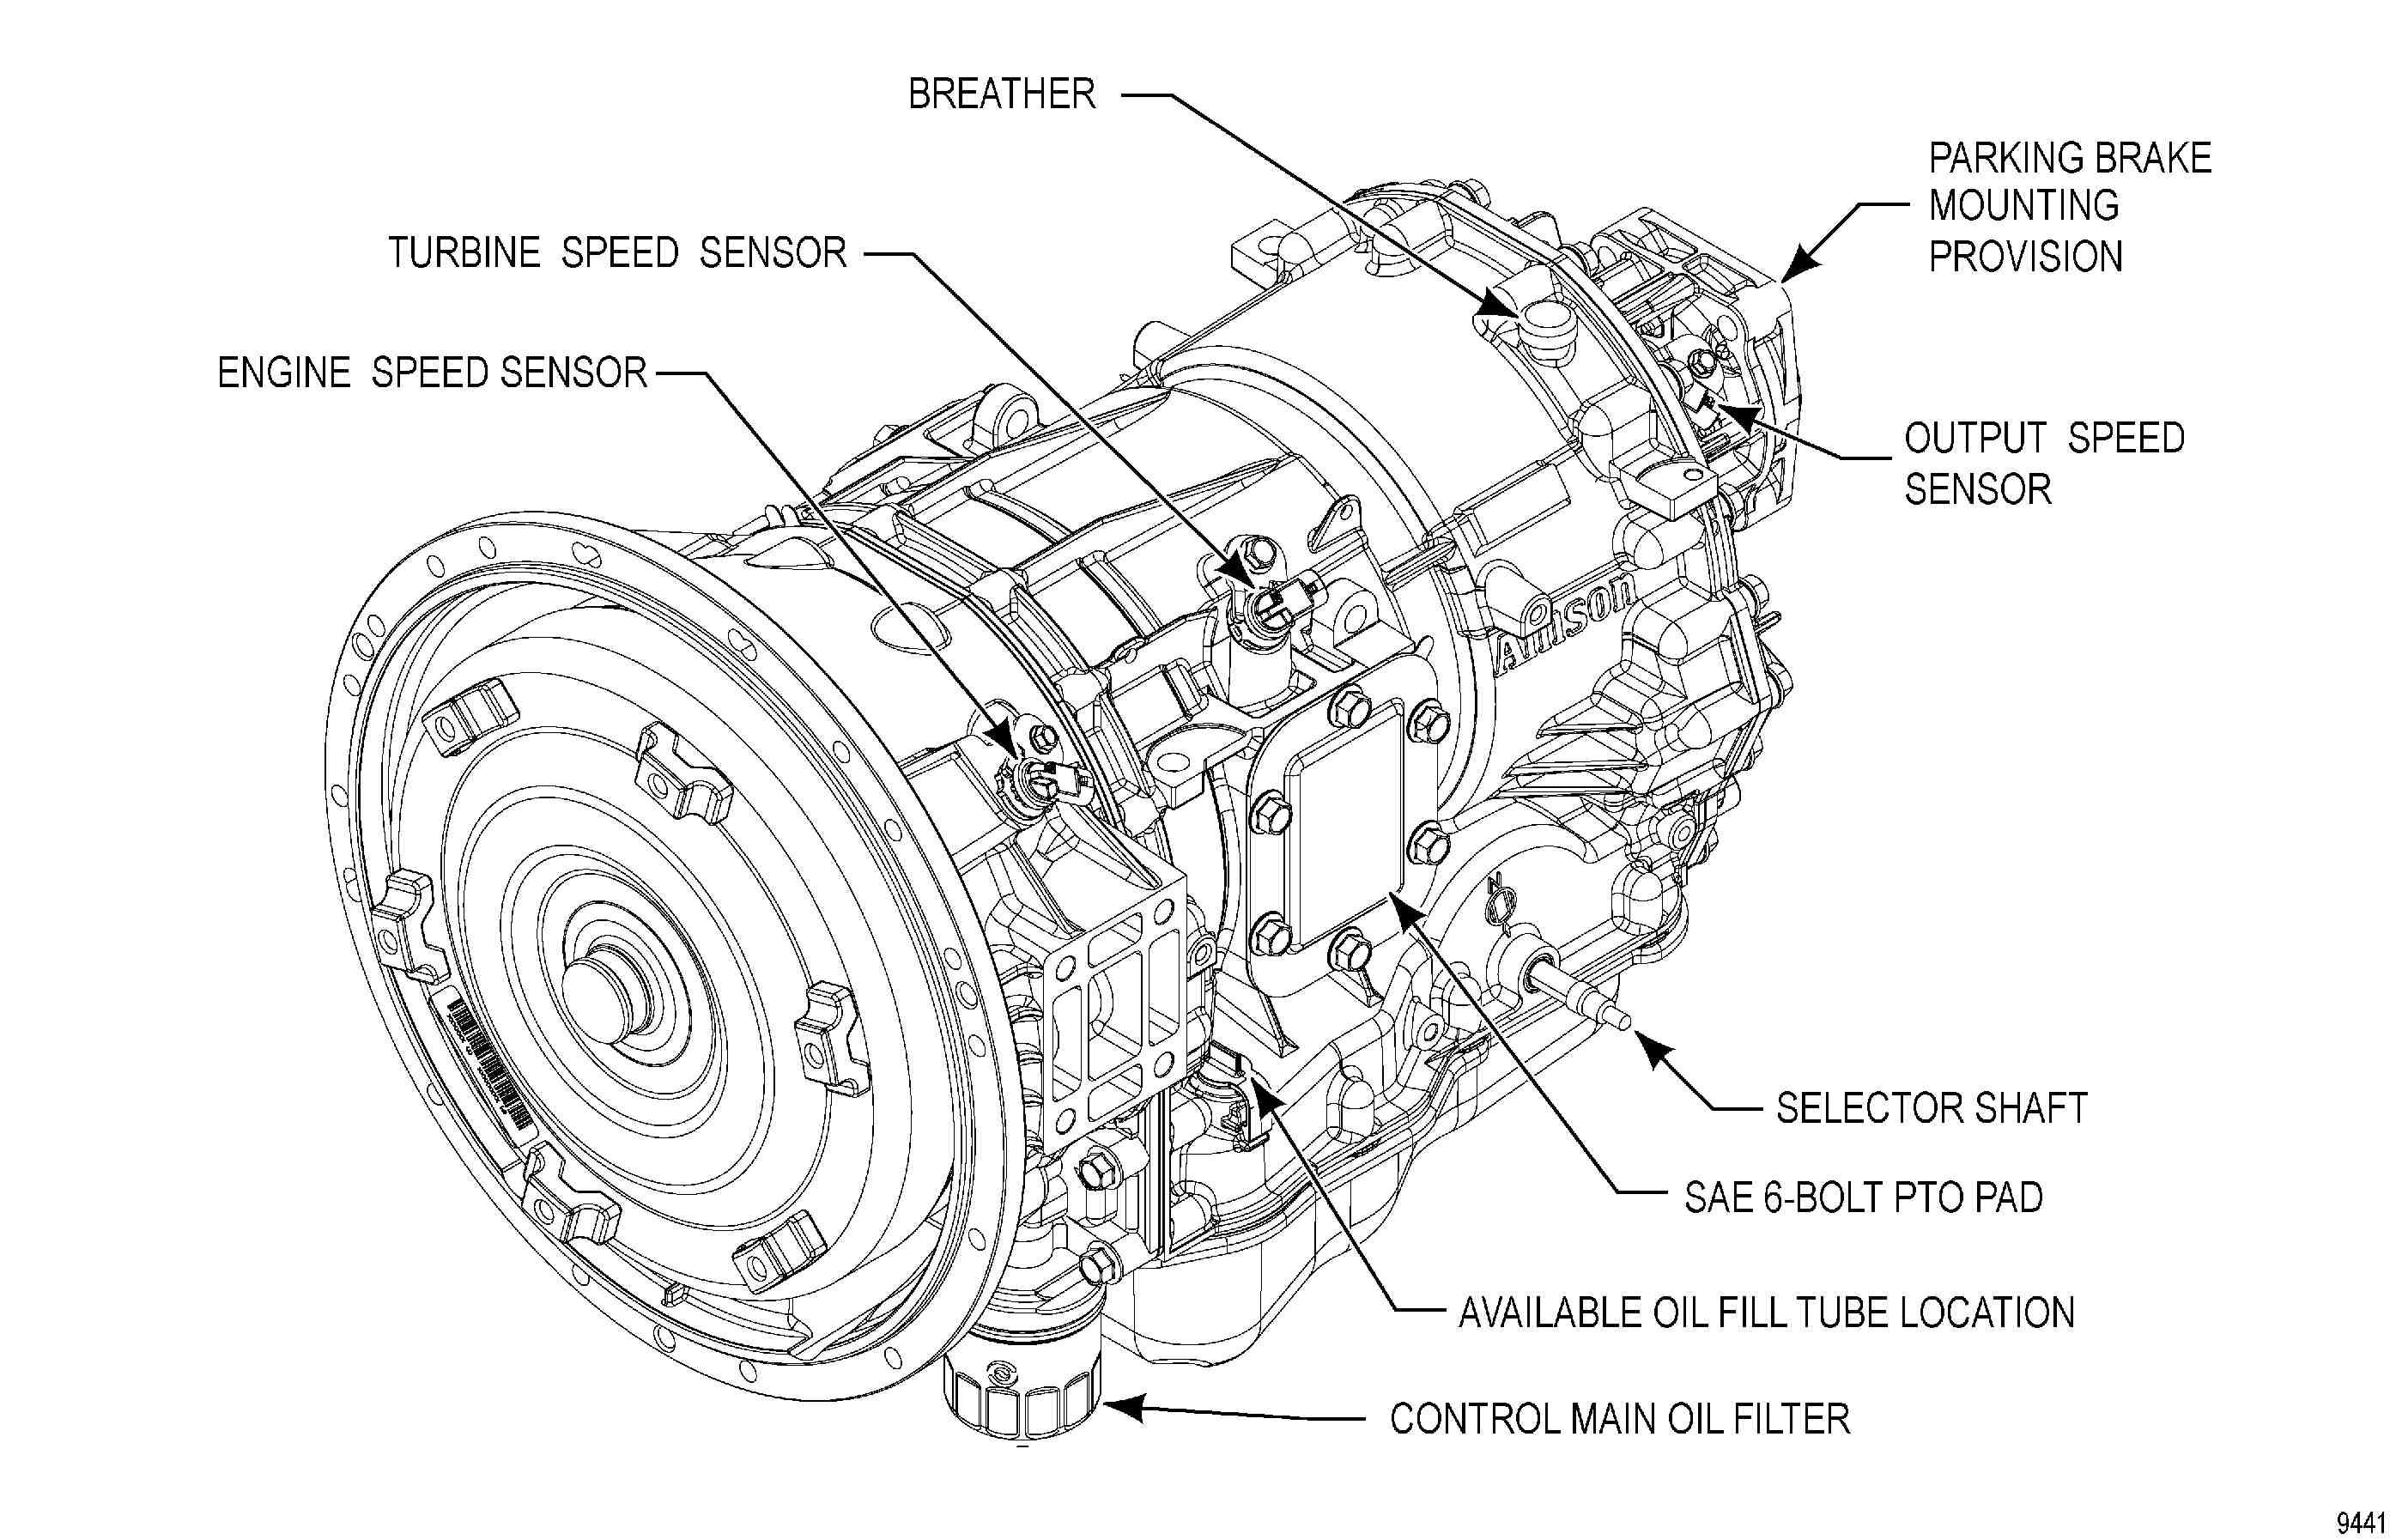 2012 New Chevrolet Corvette Fuse Box Diagram